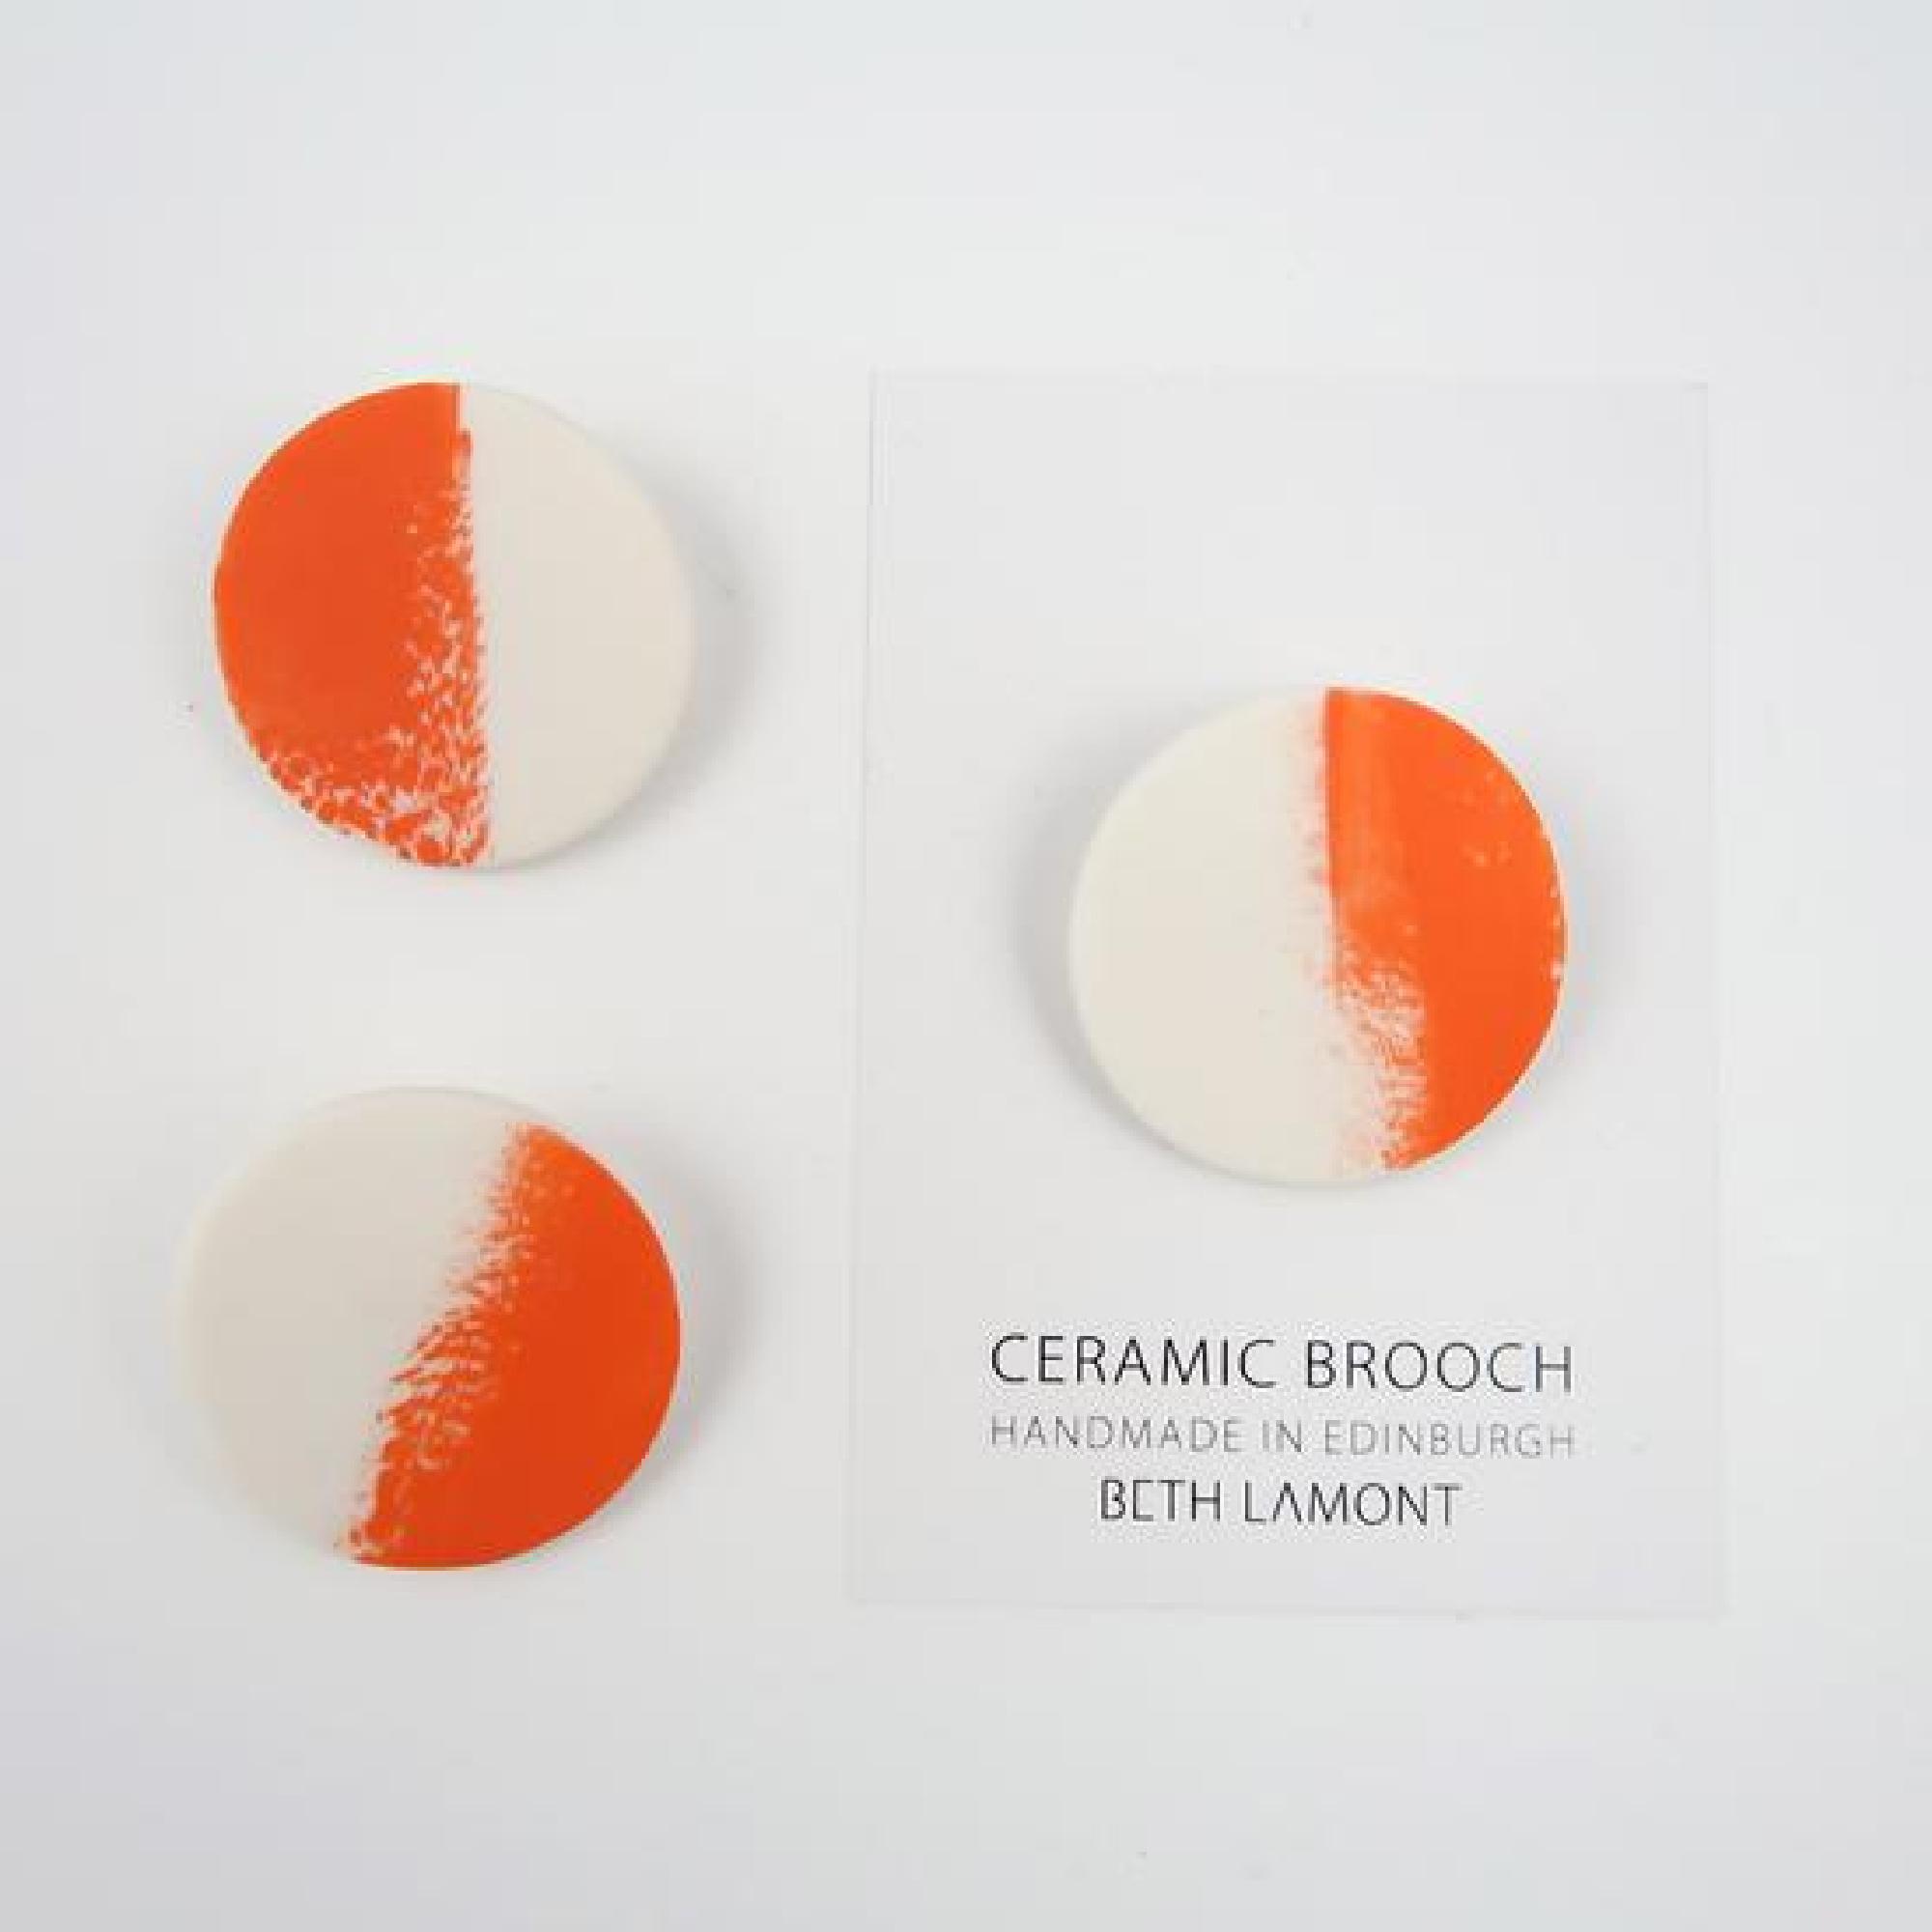 Brush Stroke Brooch by Beth Lamont